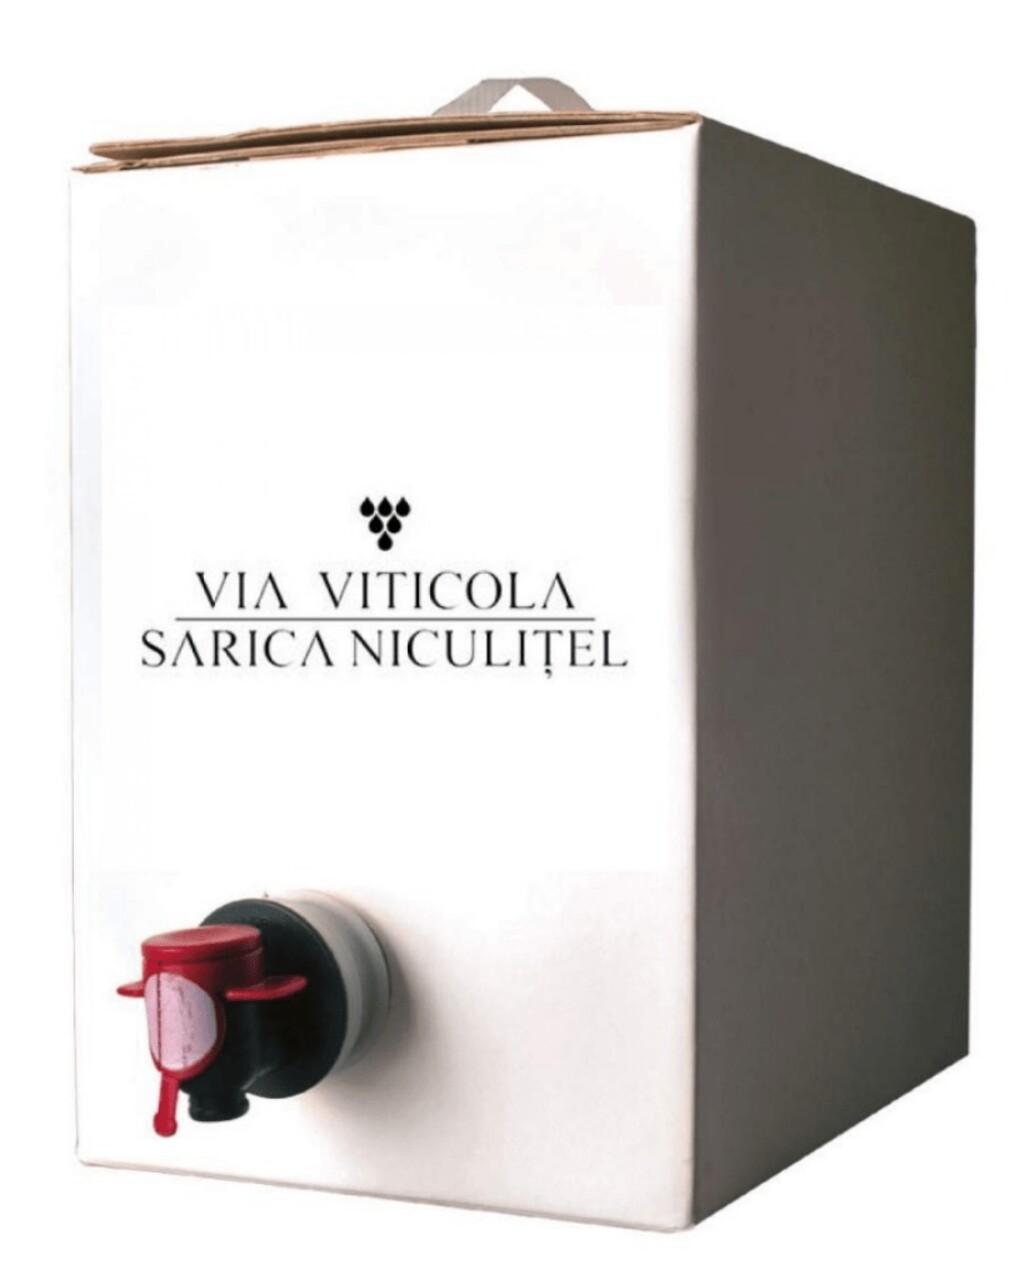 Sarica Niculitel Aligole Rosu Baricat Usor BIB 3L